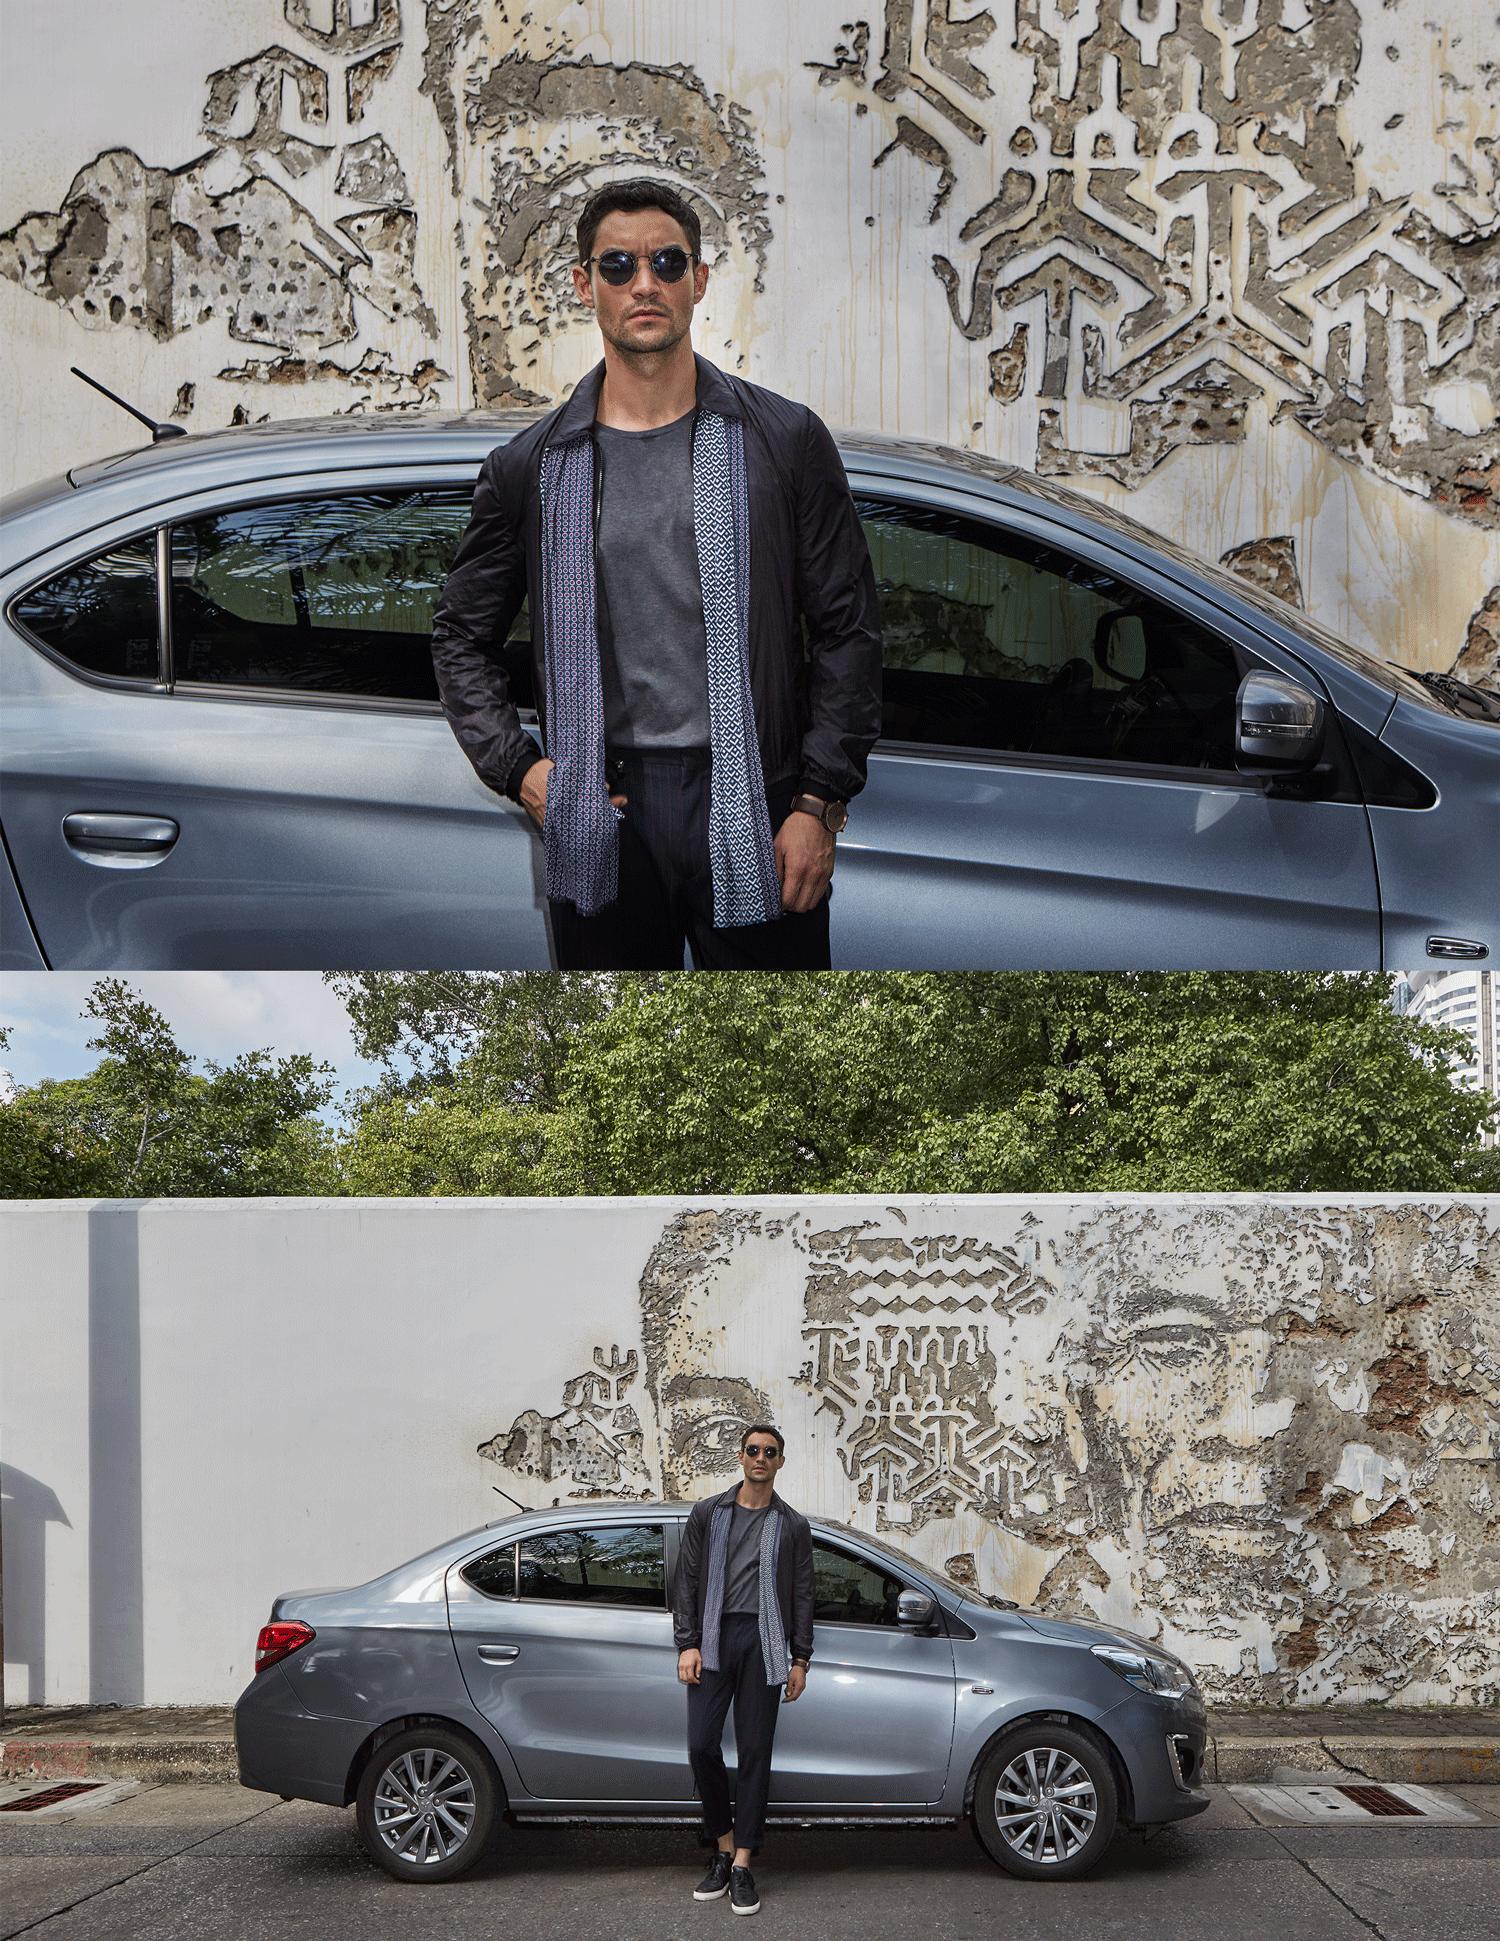 car : Mitsubishi NEW Attrage  jacket : CK Calvin Klein / sunglasses : TAVAT